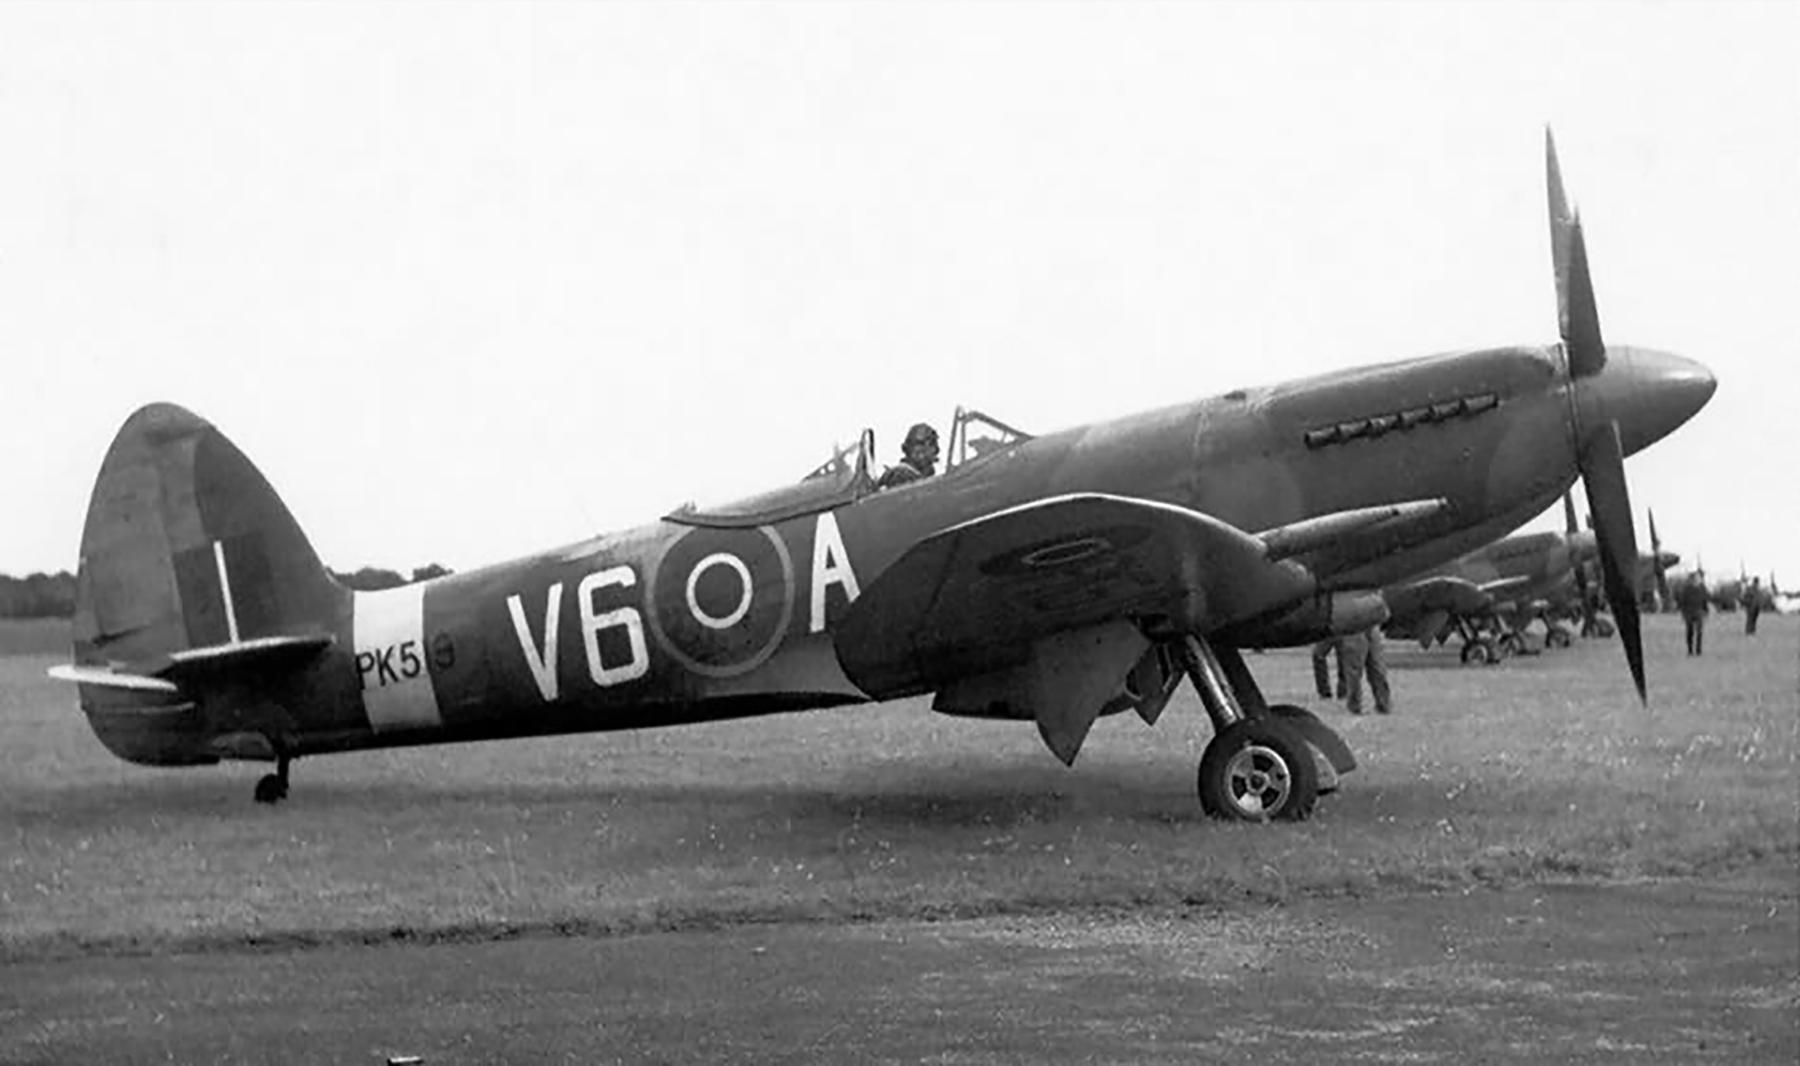 Spitfire F22 RAF 615Sqn V6A PK519 1947 web 01